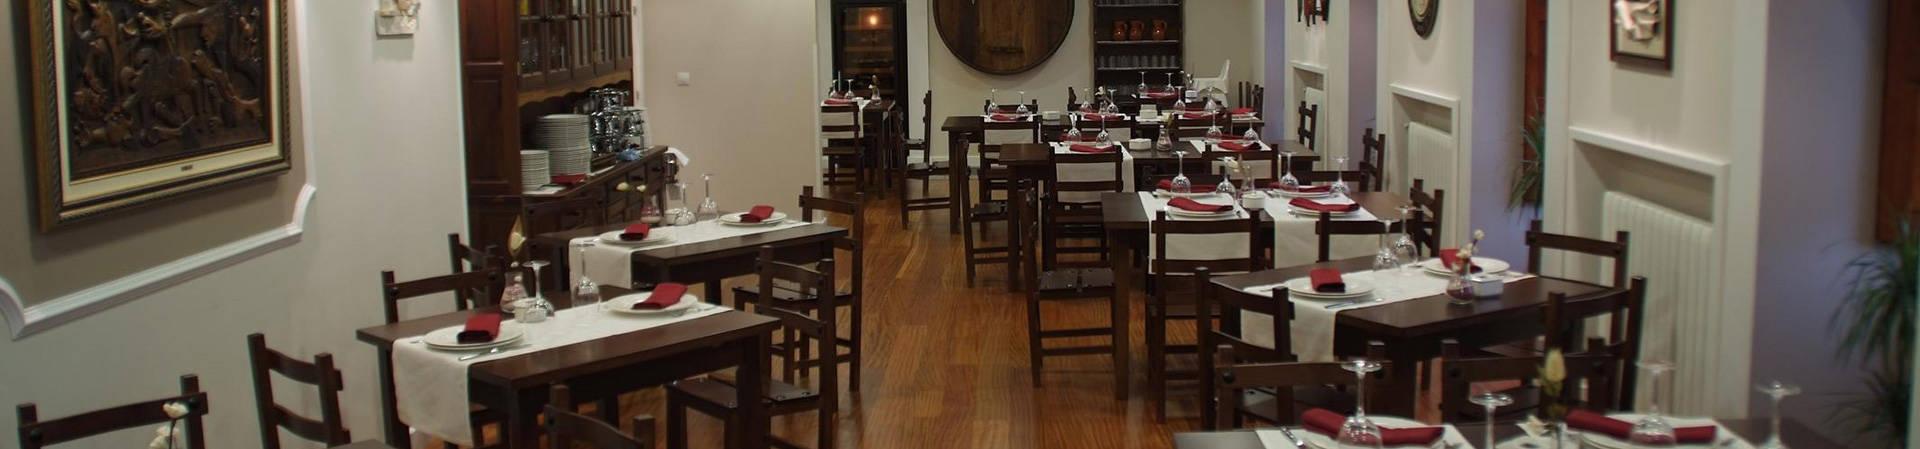 Muskiz Sagardotegia Restaurante Muskiz Bizkaia